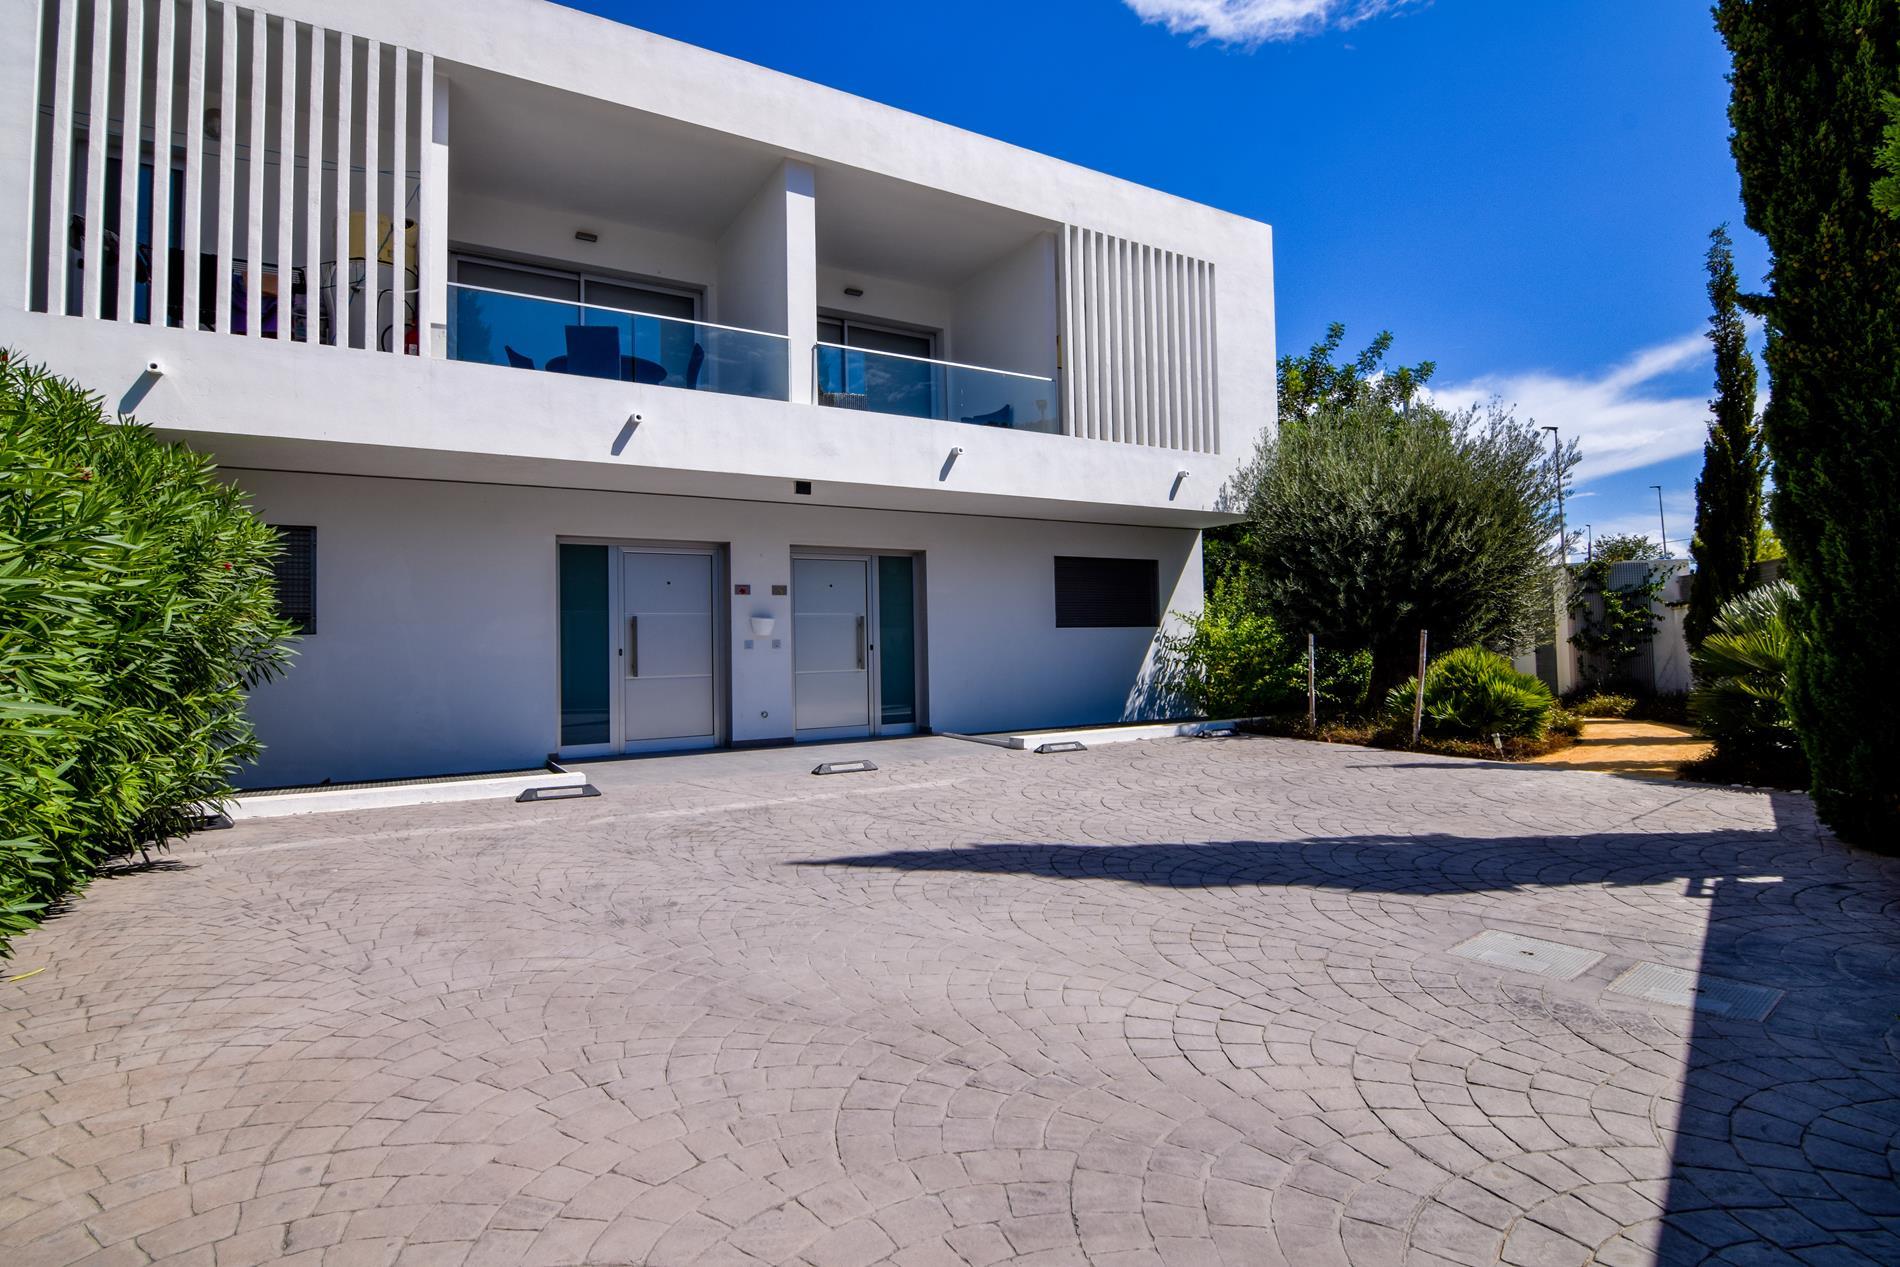 Chalet Pareado en venta en Albir, urbanización de 4 unidades